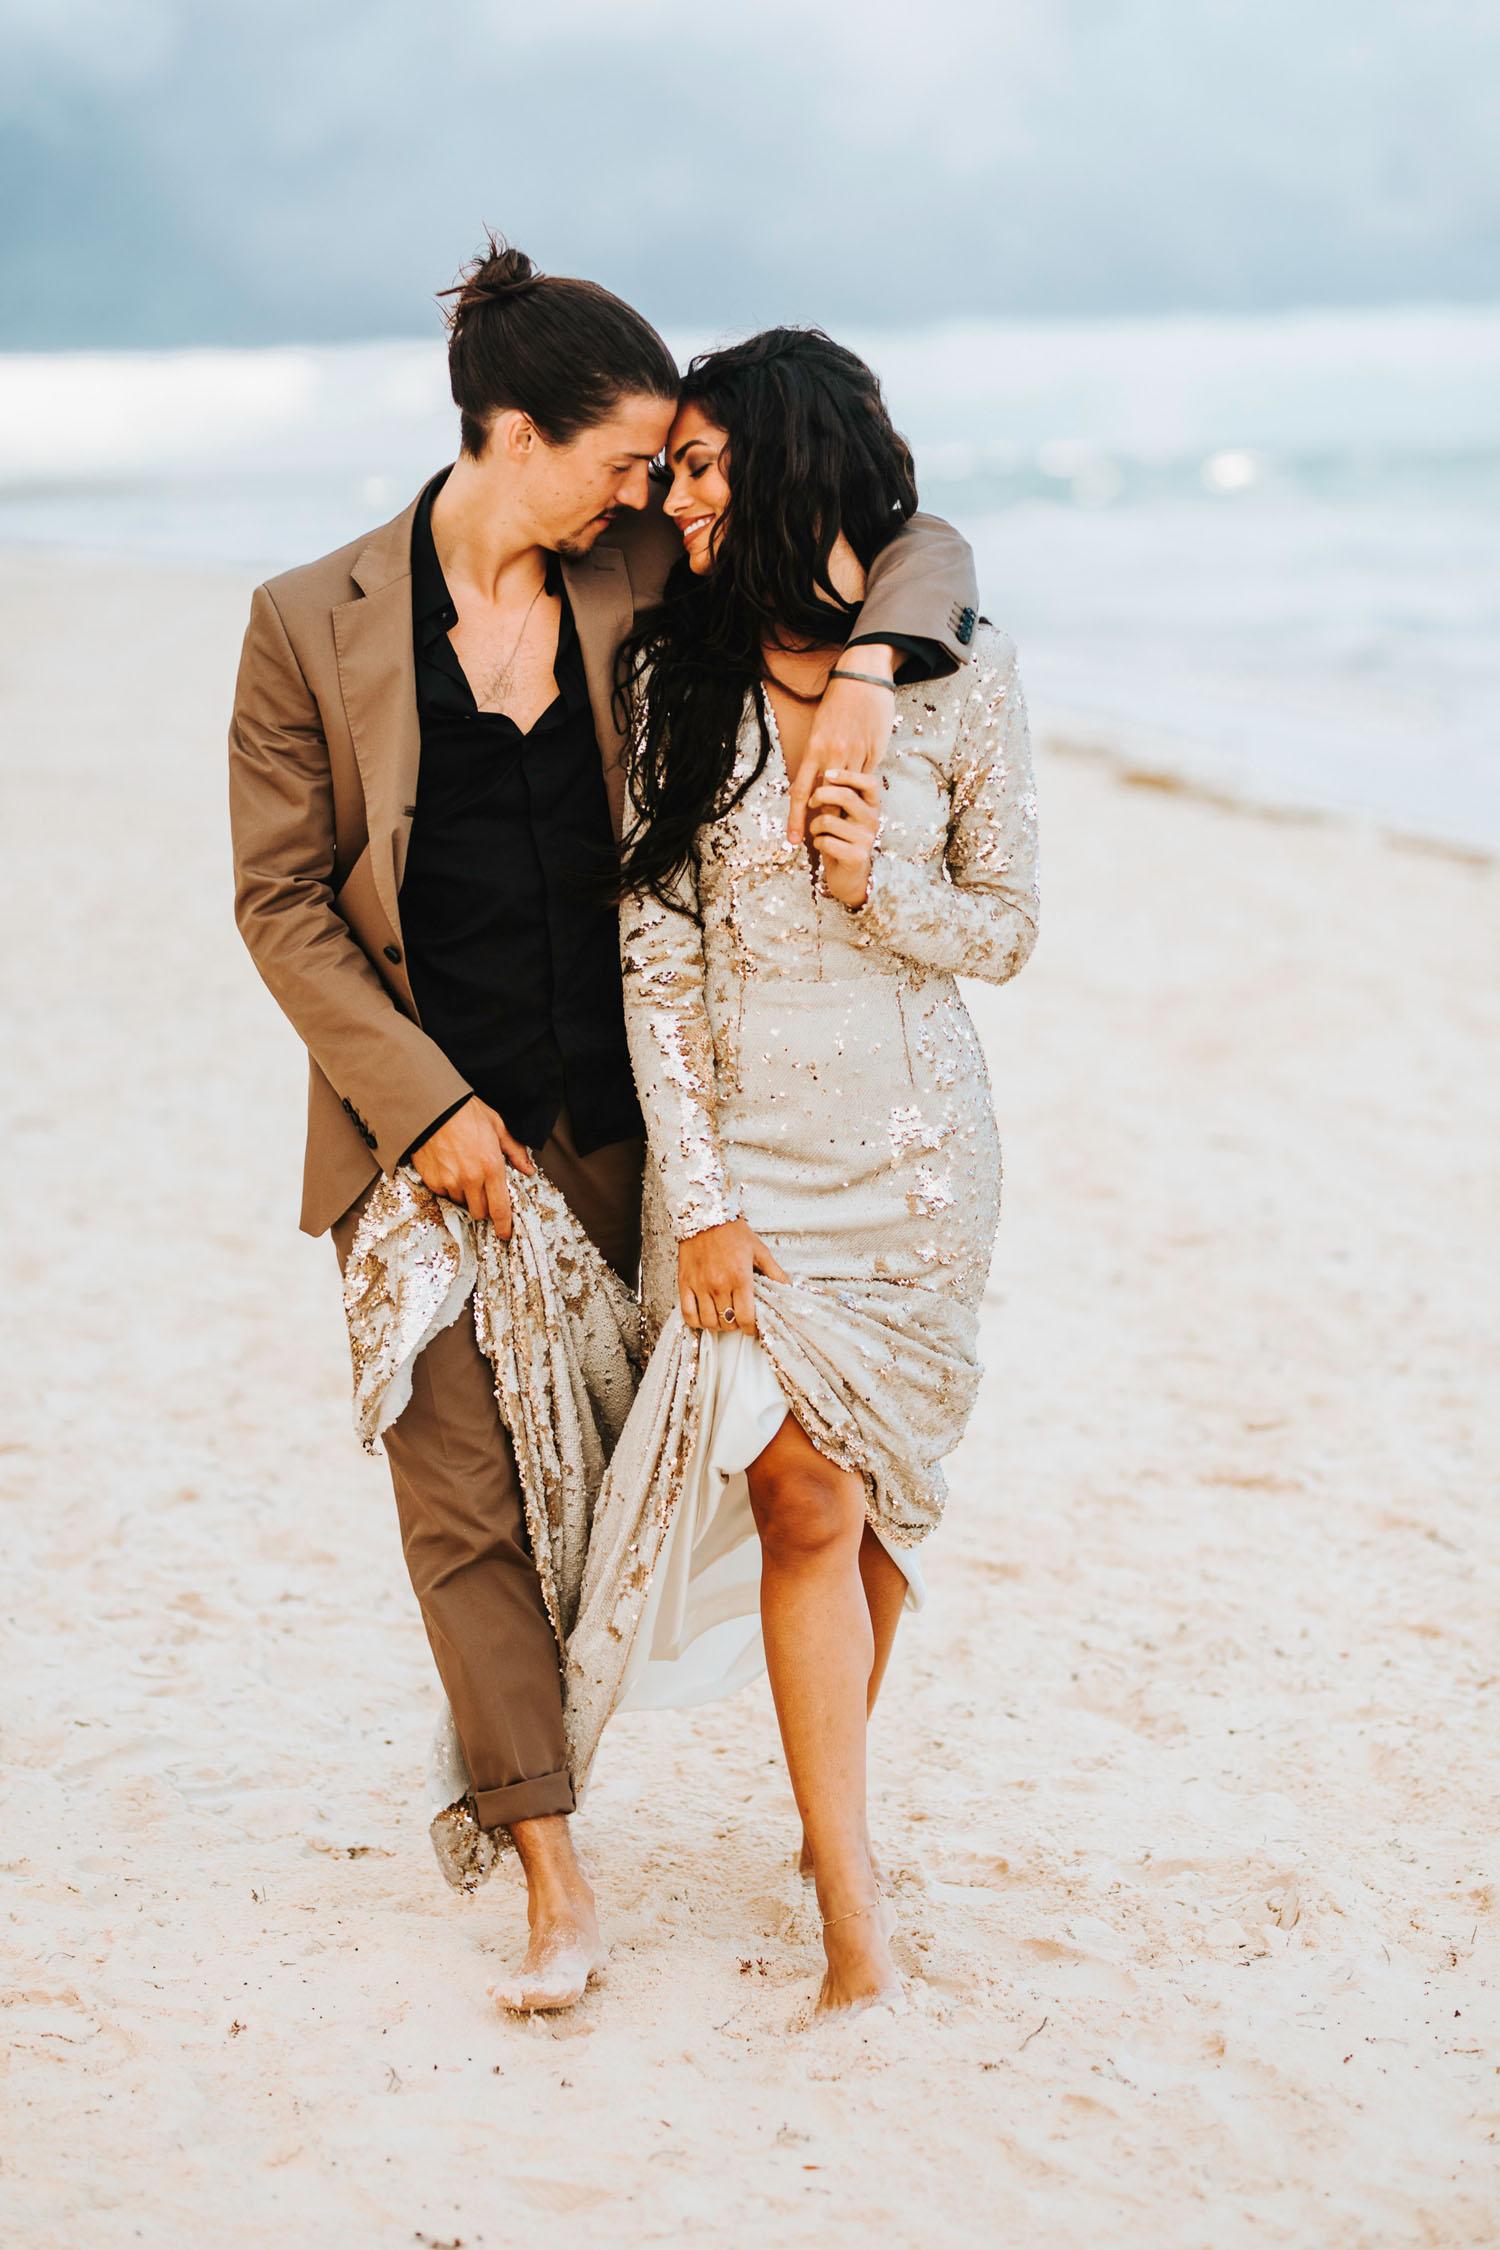 Celestial Wedding Inspiration on the Beach in Tulum